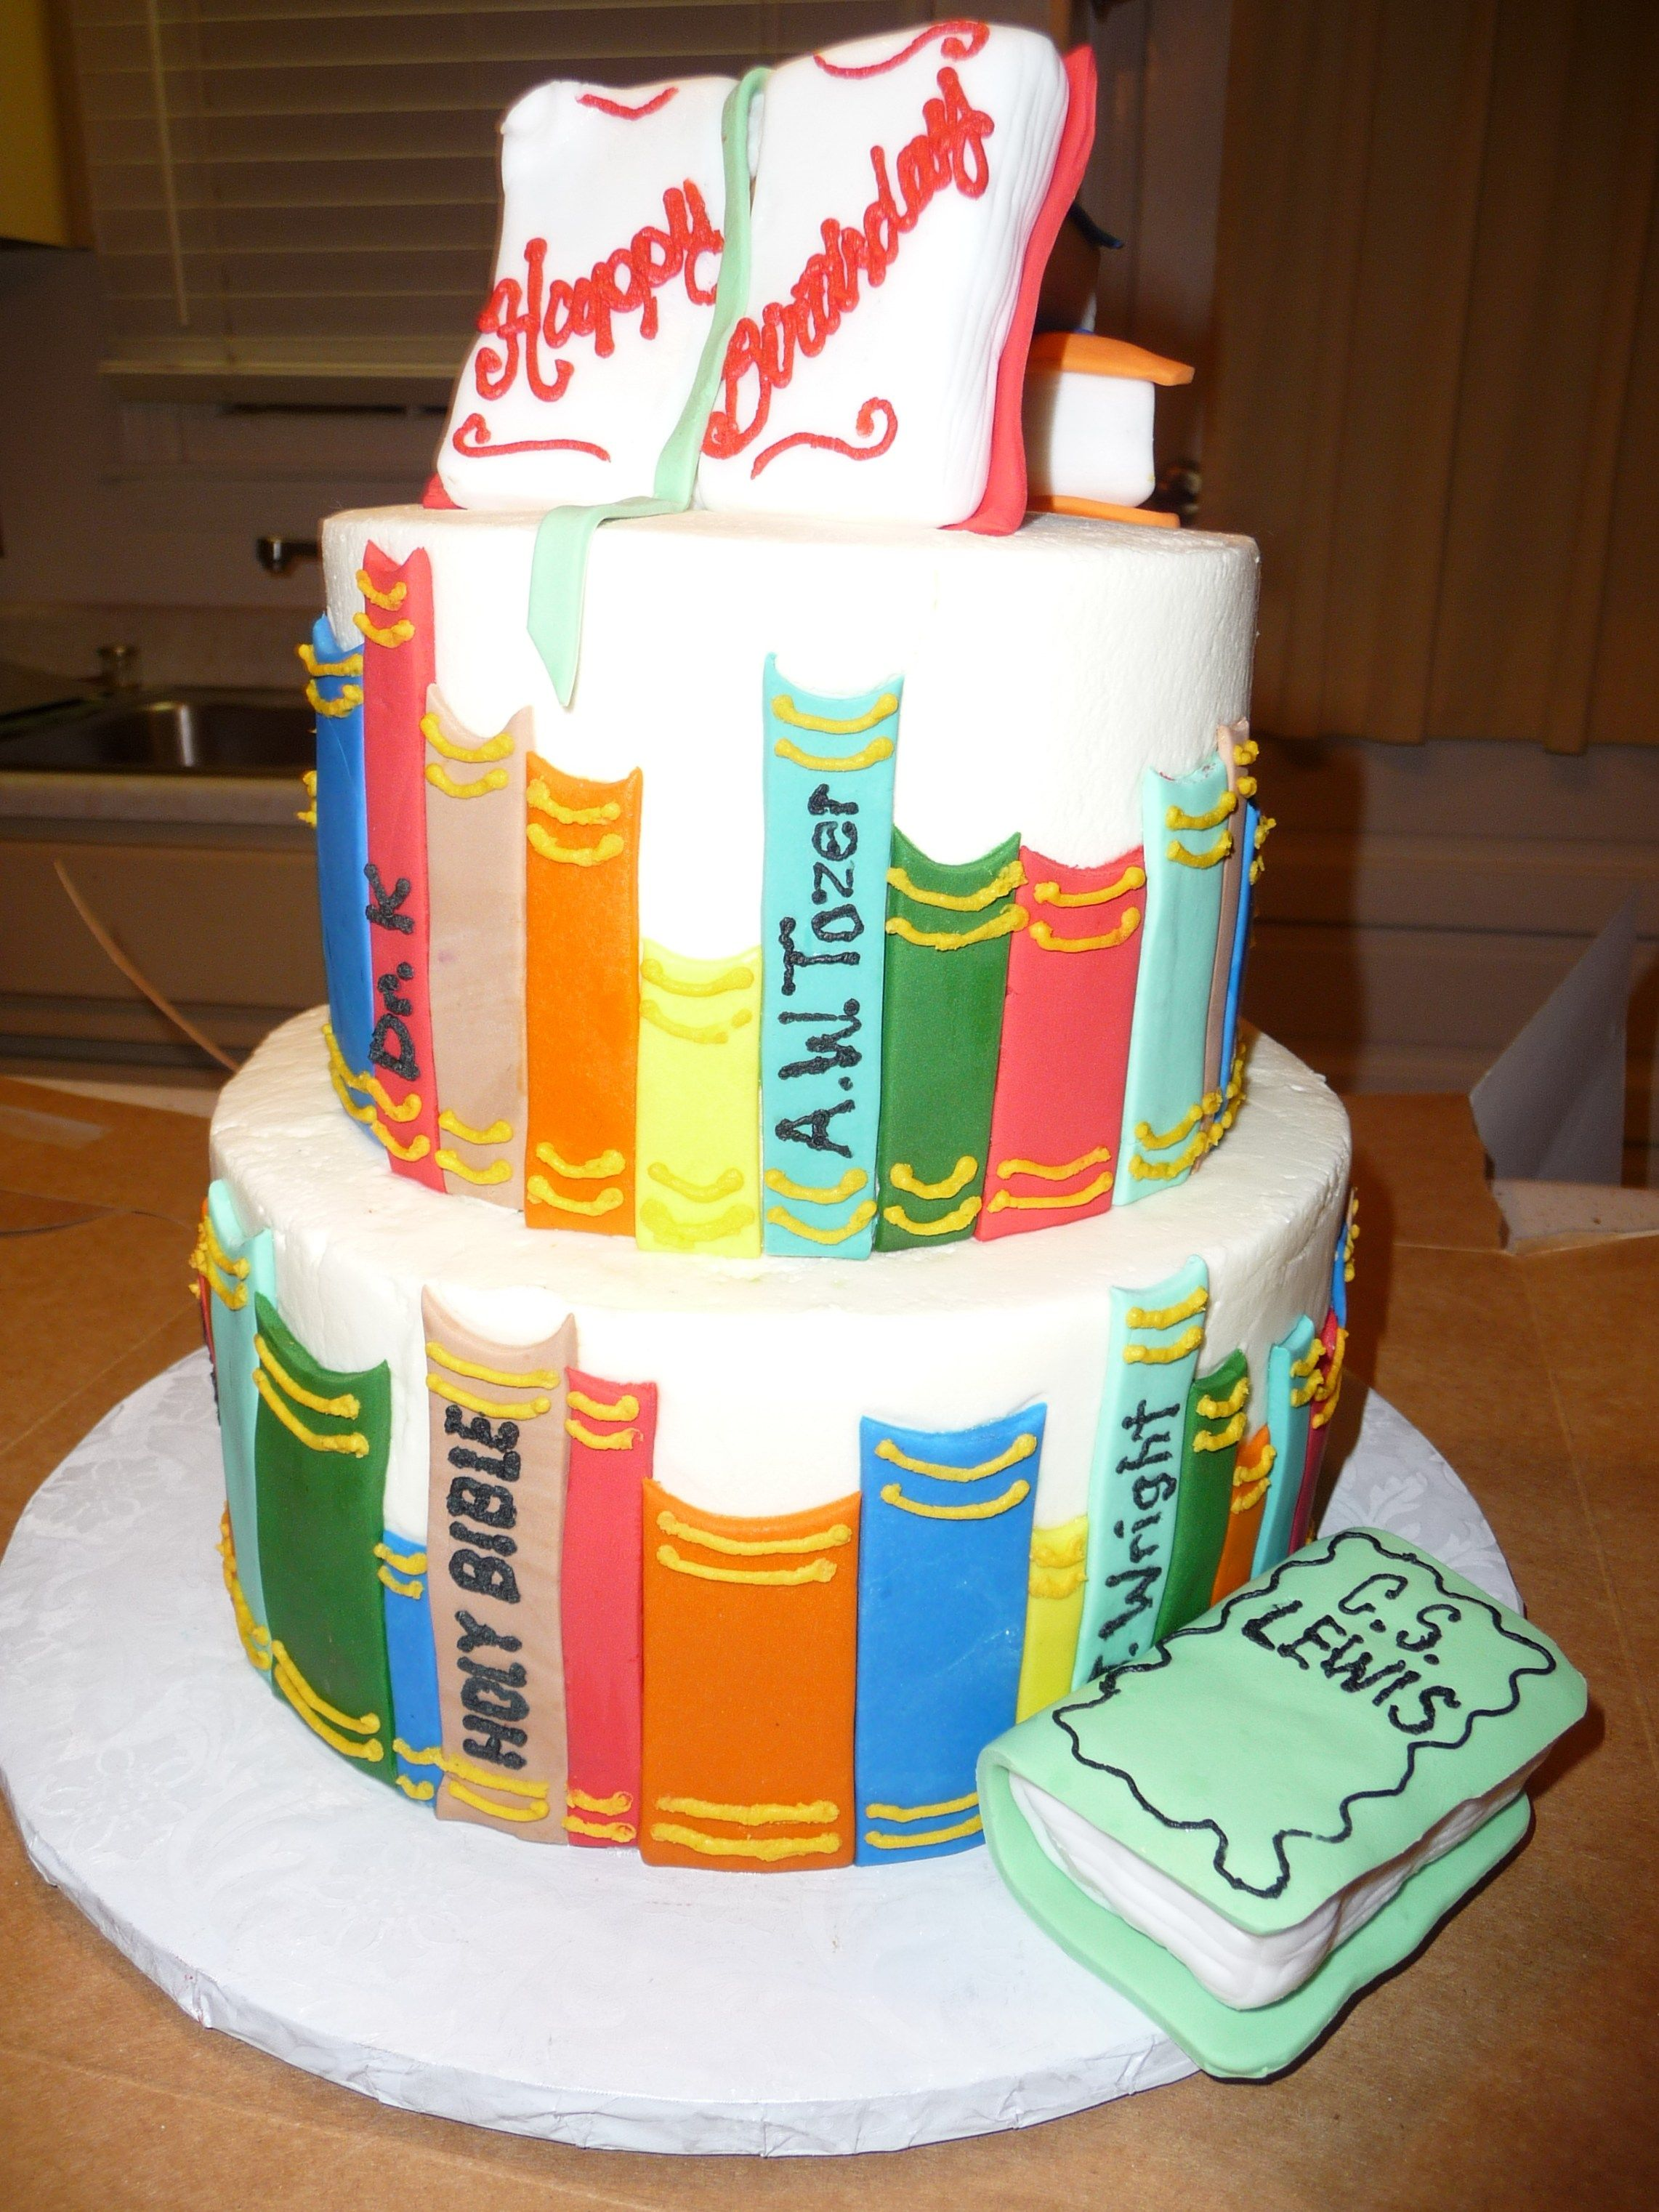 Awe Inspiring Book Birthday Cake 7 Book Themed Birthday Cakes Photo Book Themed Funny Birthday Cards Online Alyptdamsfinfo